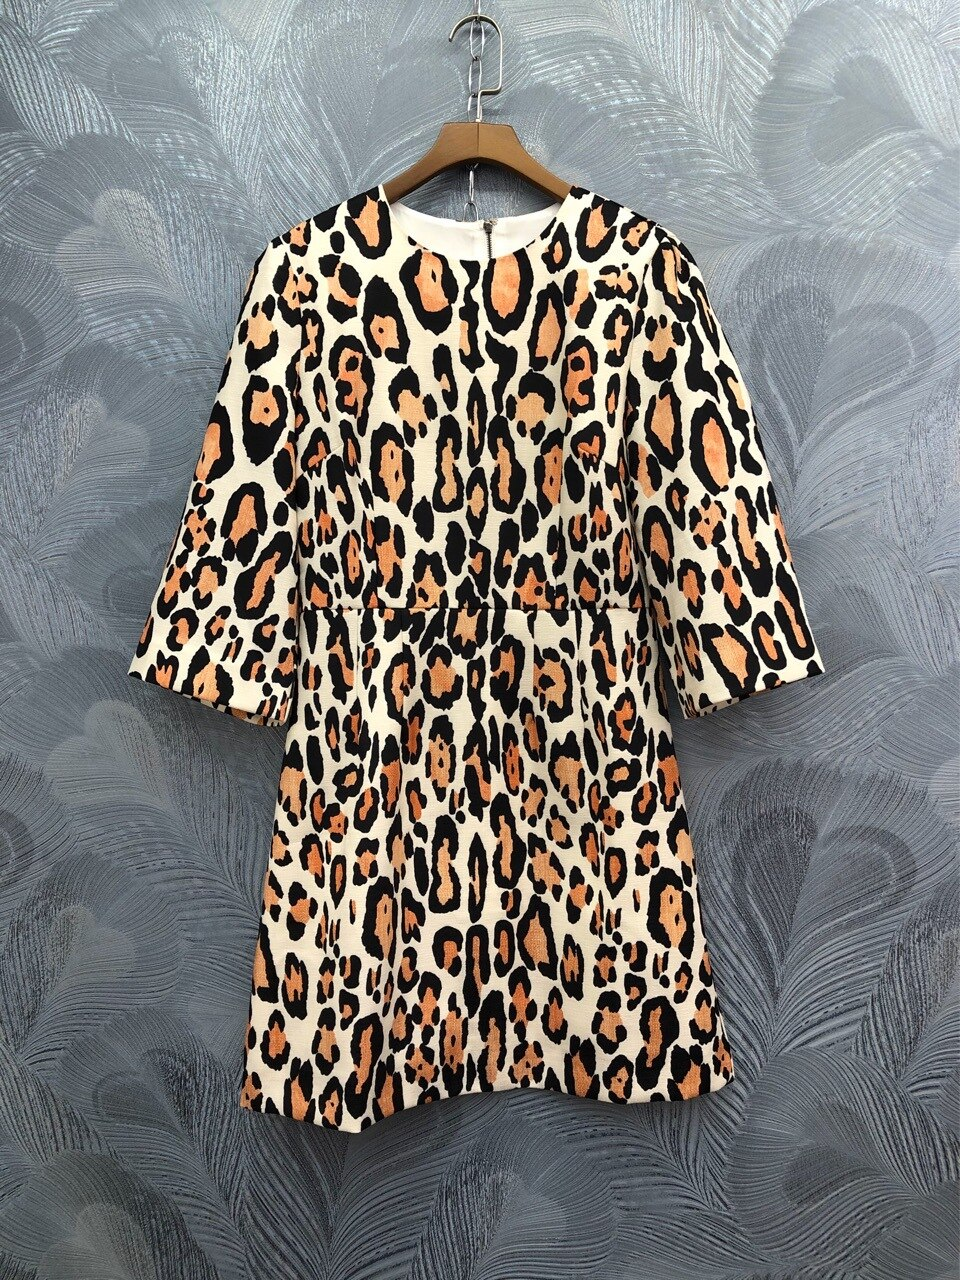 Europe&America women sexy leopard dress  spring summer runways half sleeve dress B236